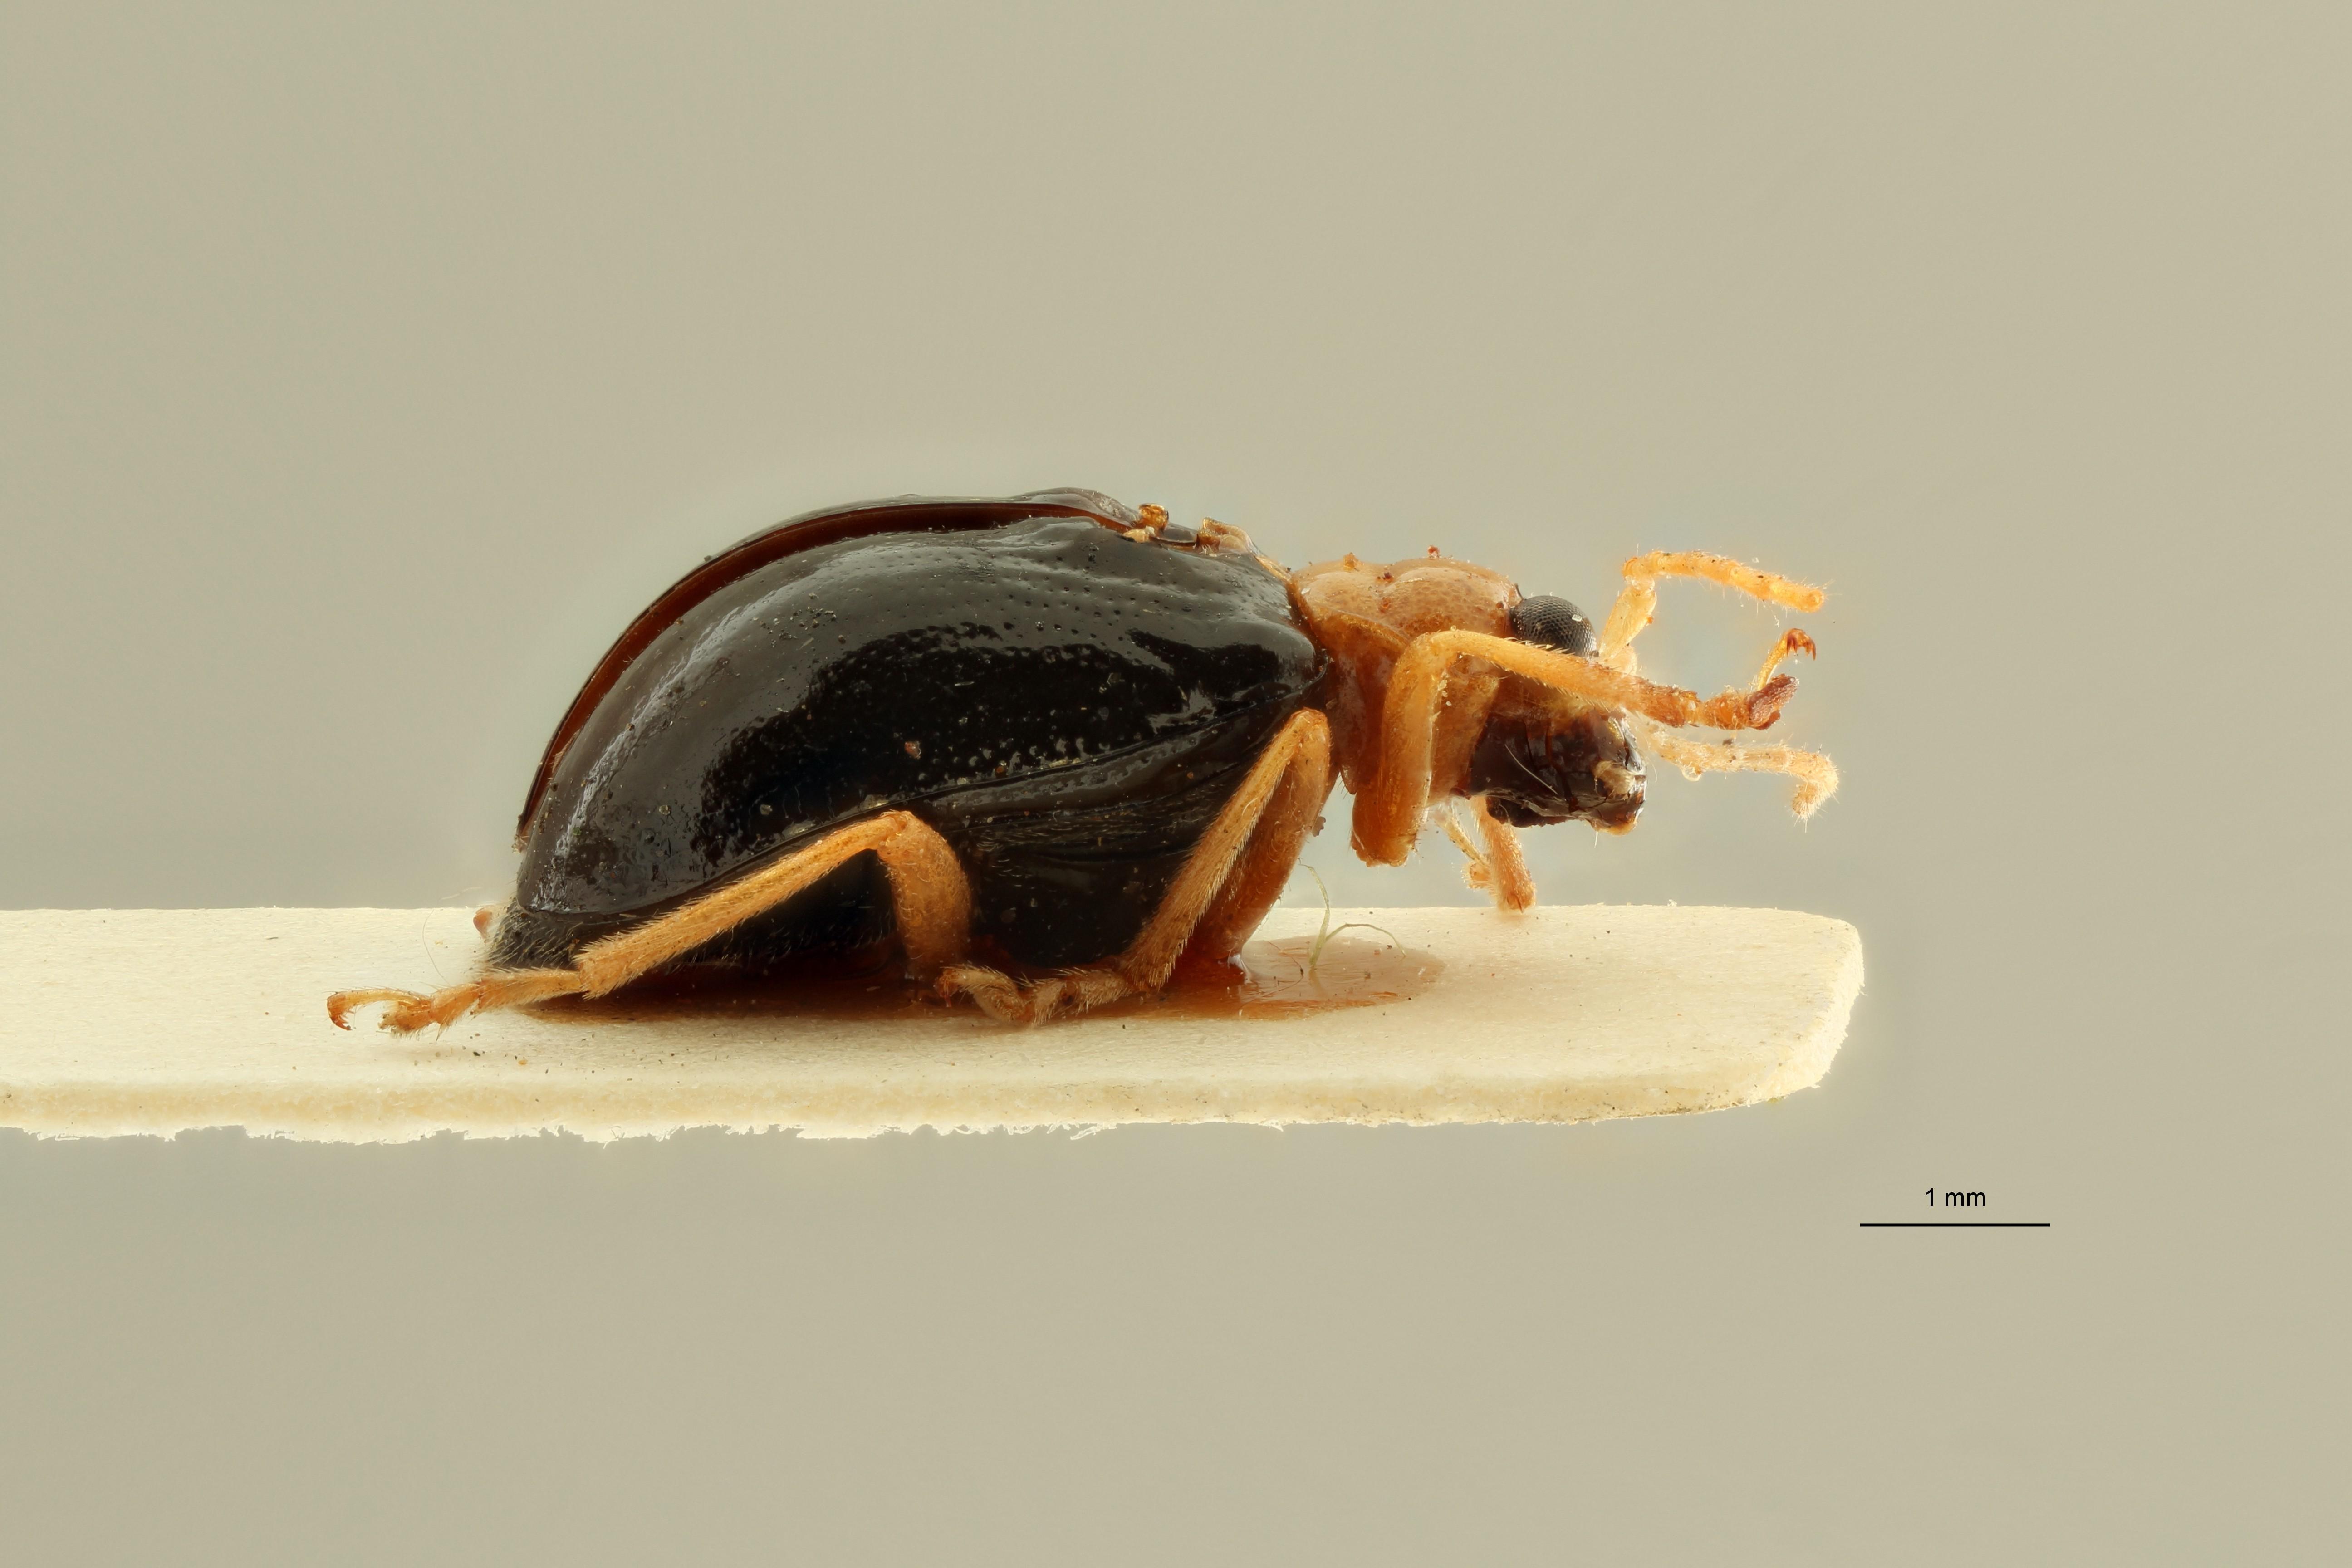 Pseudocophora javanensis pt L ZS PMax Scaled.jpeg